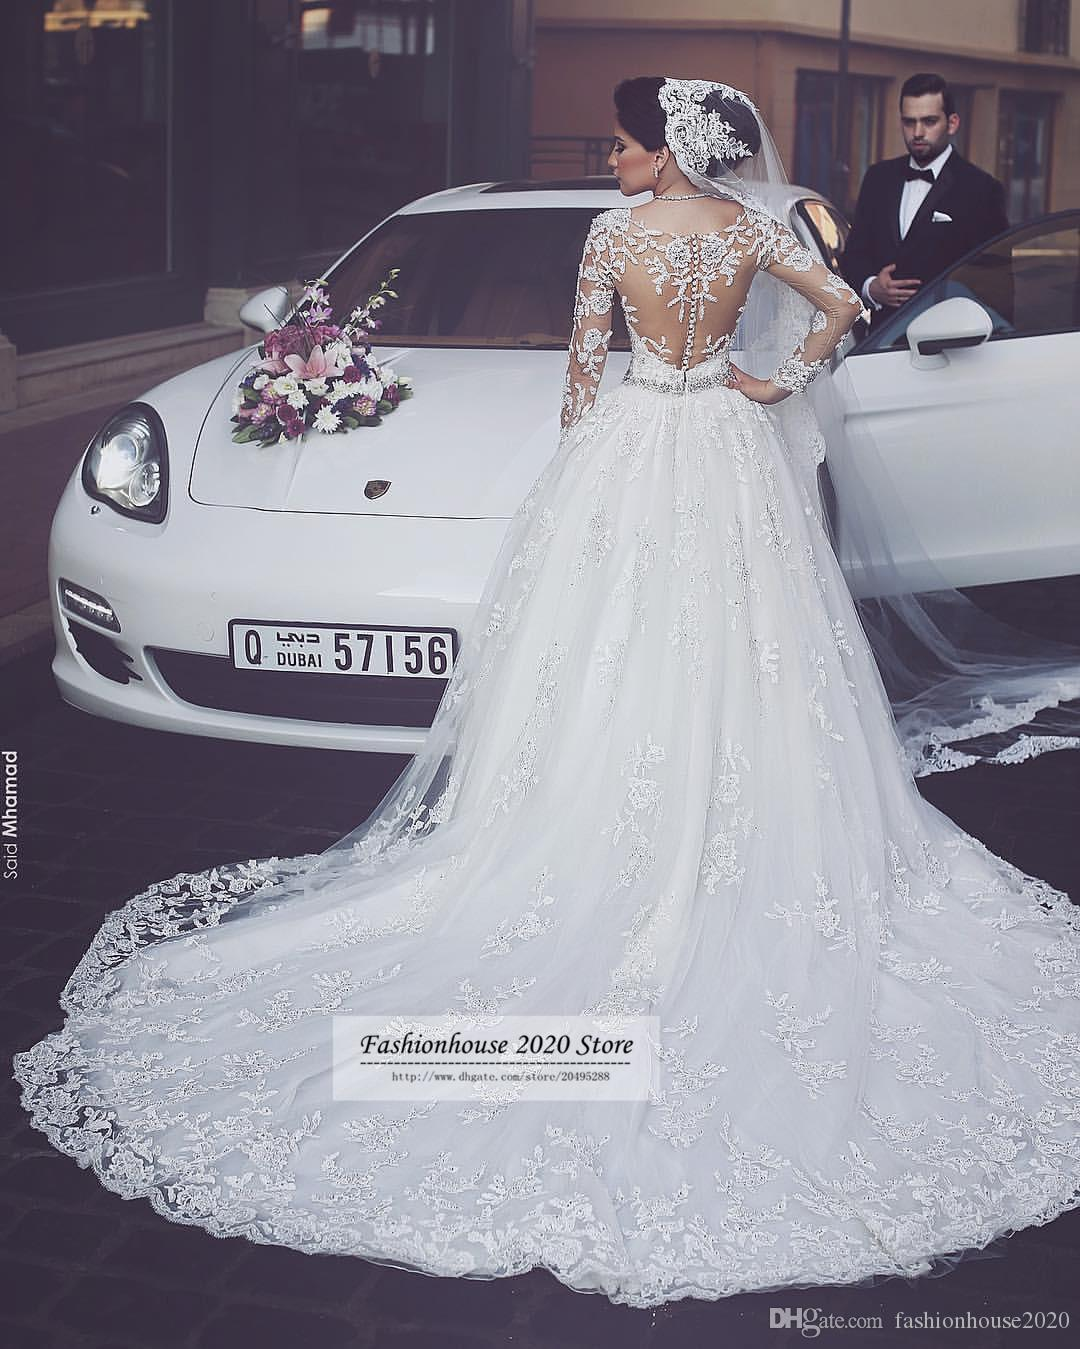 Sexy Long Sleeve Arabic Wedding Dresses 2017 Scoop Neck Applique Luxury Crystal Wedding Gowns Plus Size Wedding Bride Dresses